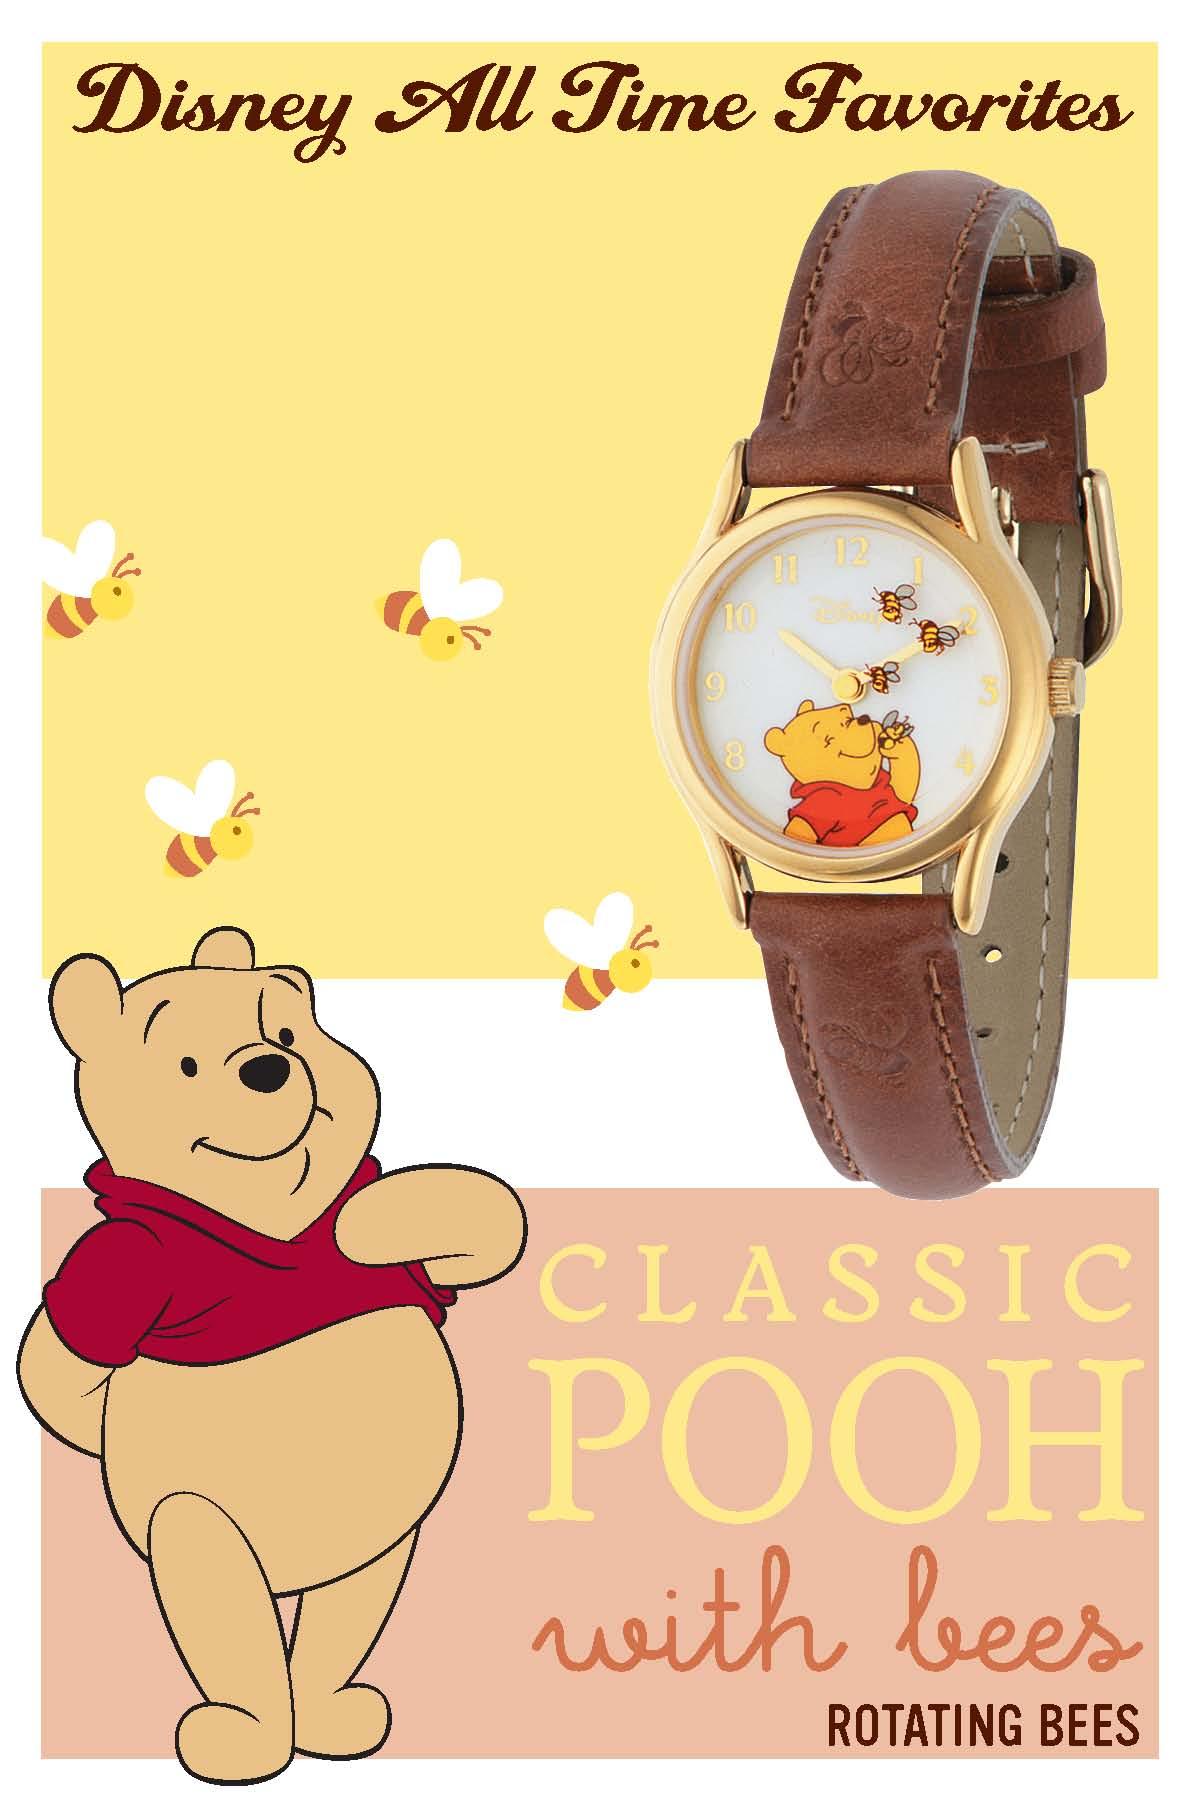 PC_Pooh.jpg